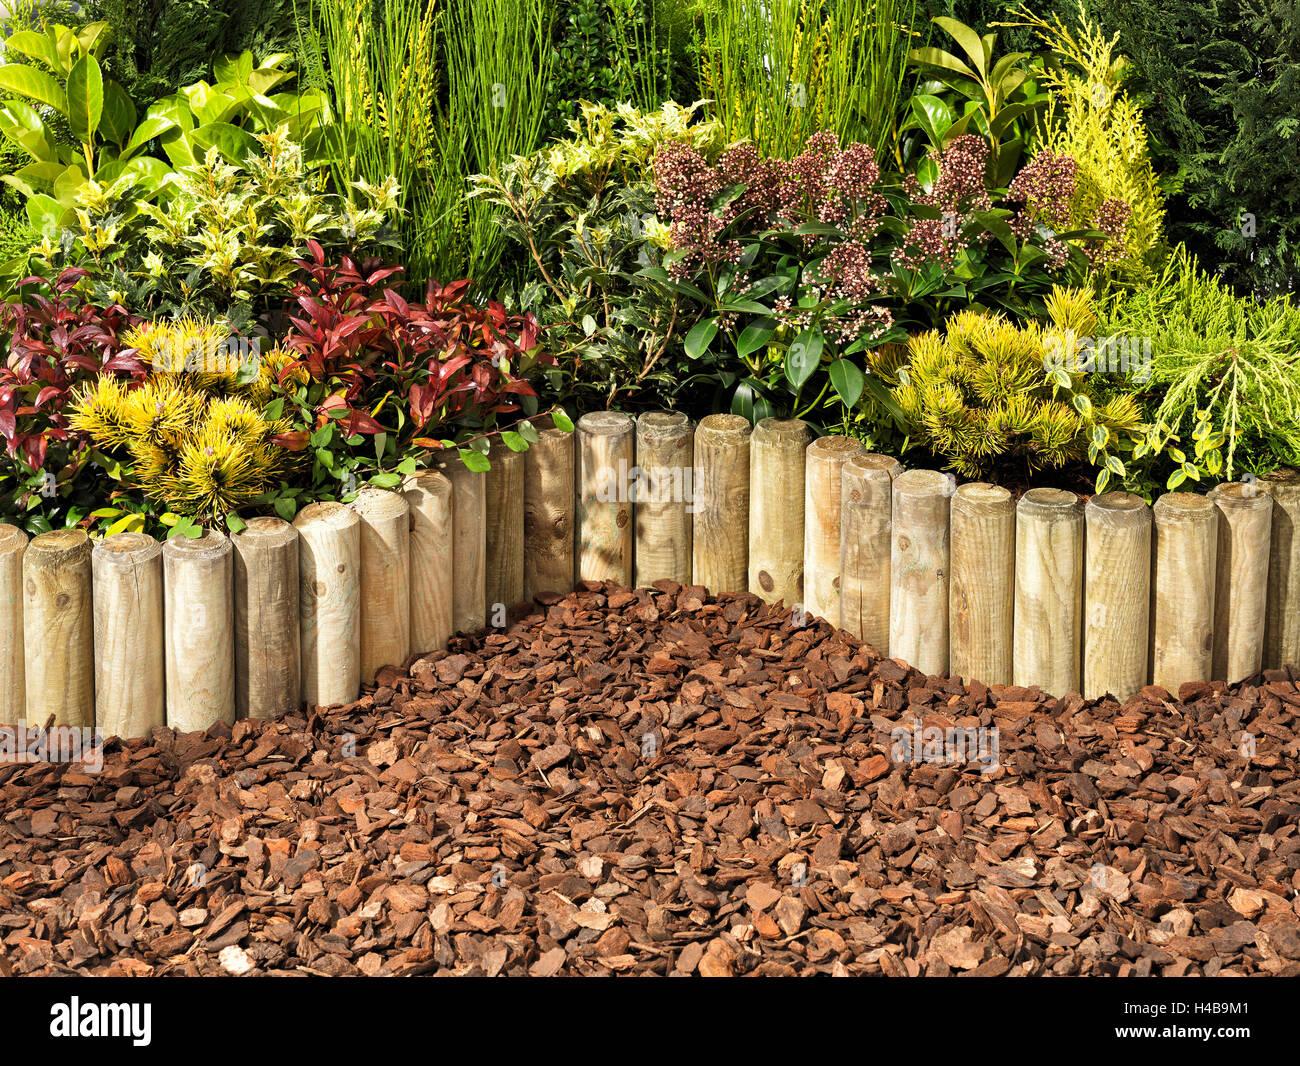 Garden Patch Stock Photos & Garden Patch Stock Images - Alamy